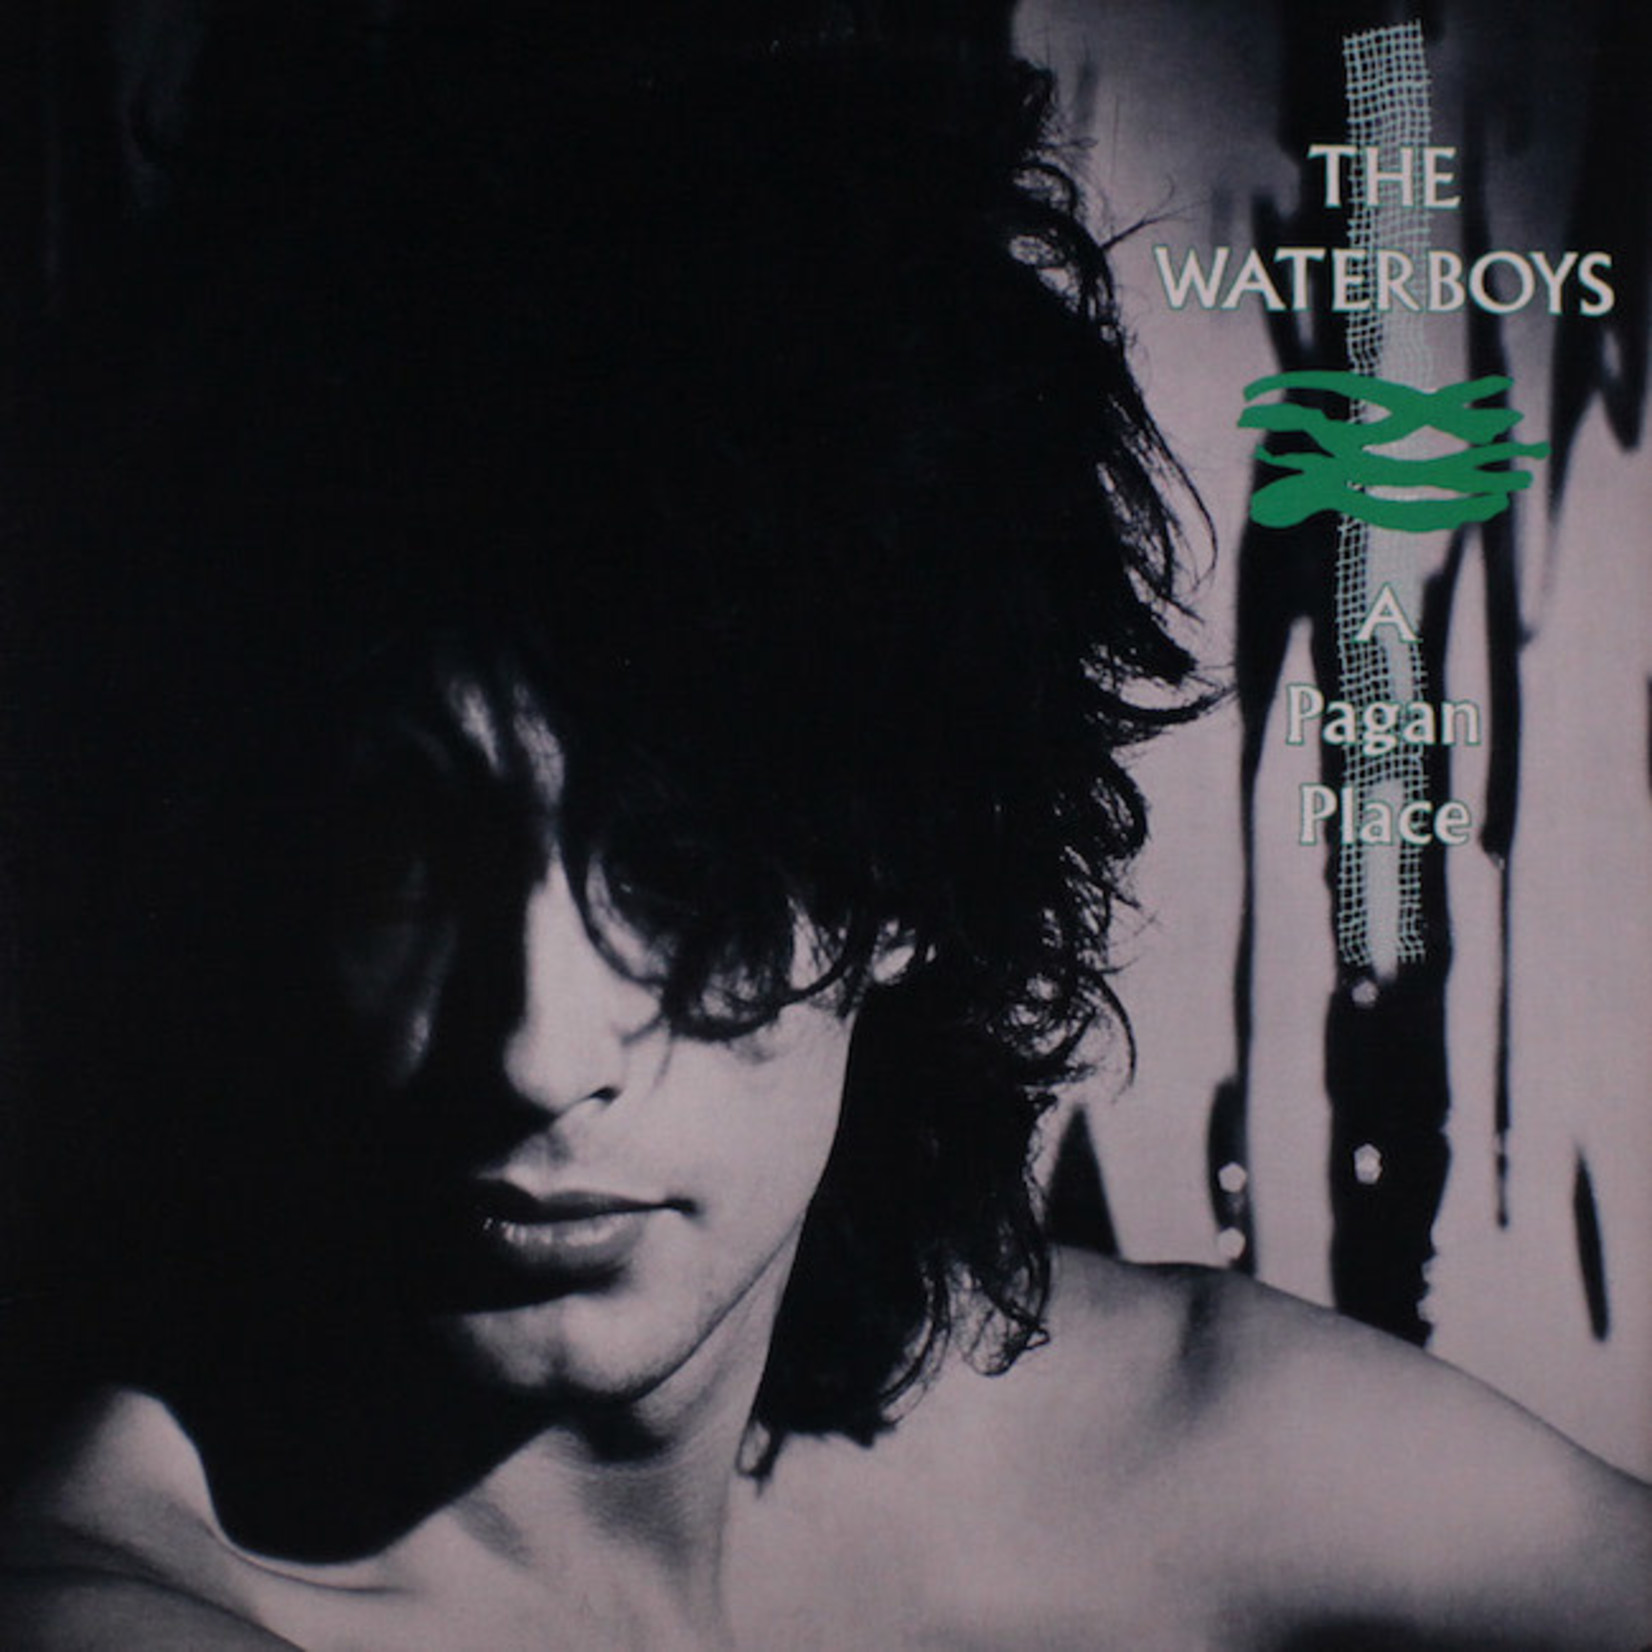 [Vintage] Waterboys: A Pagan Place